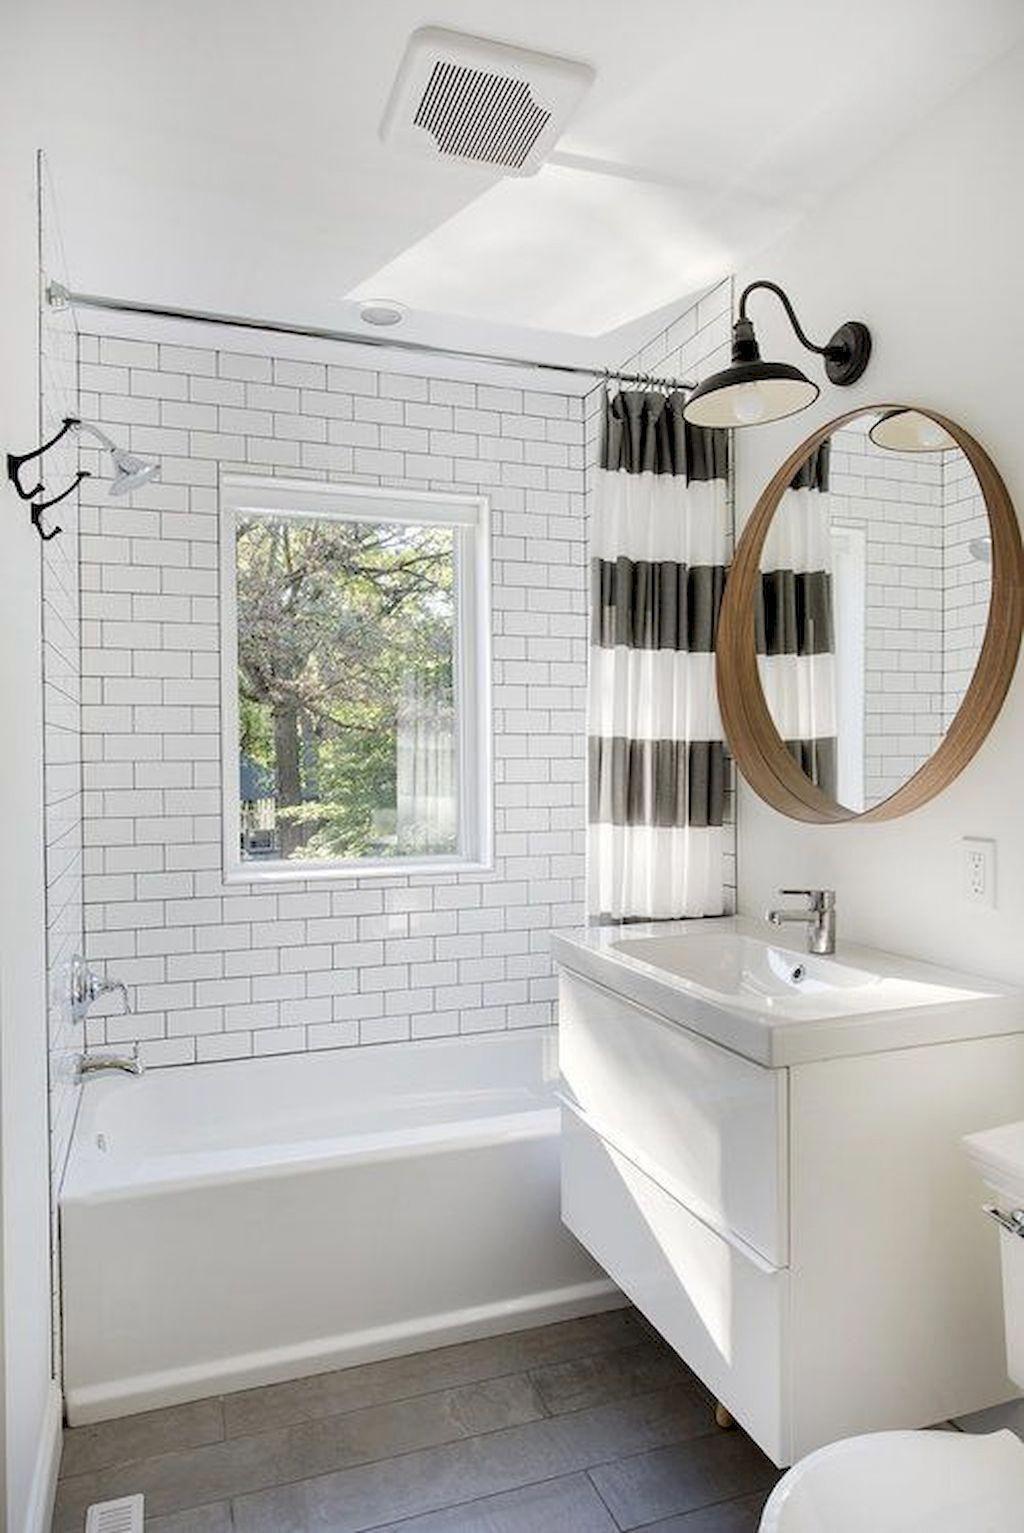 Budgetfriendlybathroomideas Budget Bathroom Remodel Modern